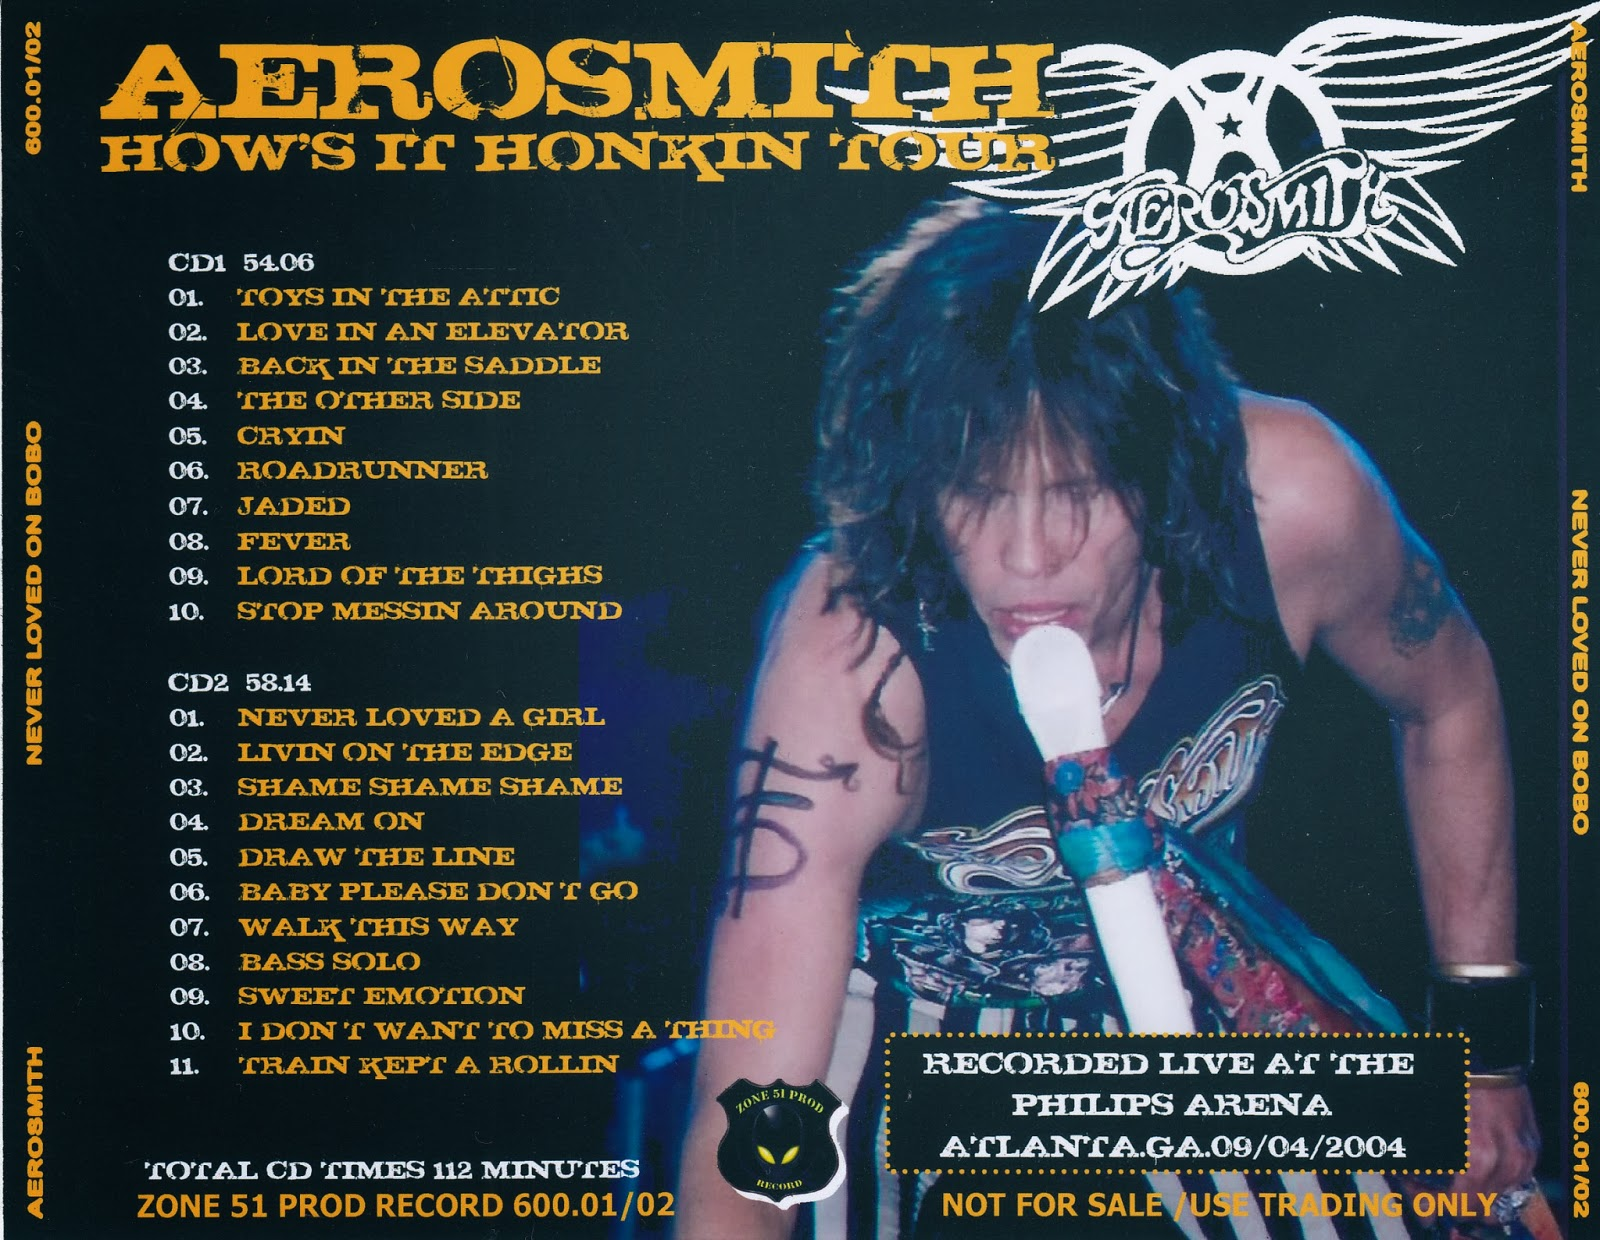 Aerosmith Bootlegs Cover Arts Never Loved On Bobo